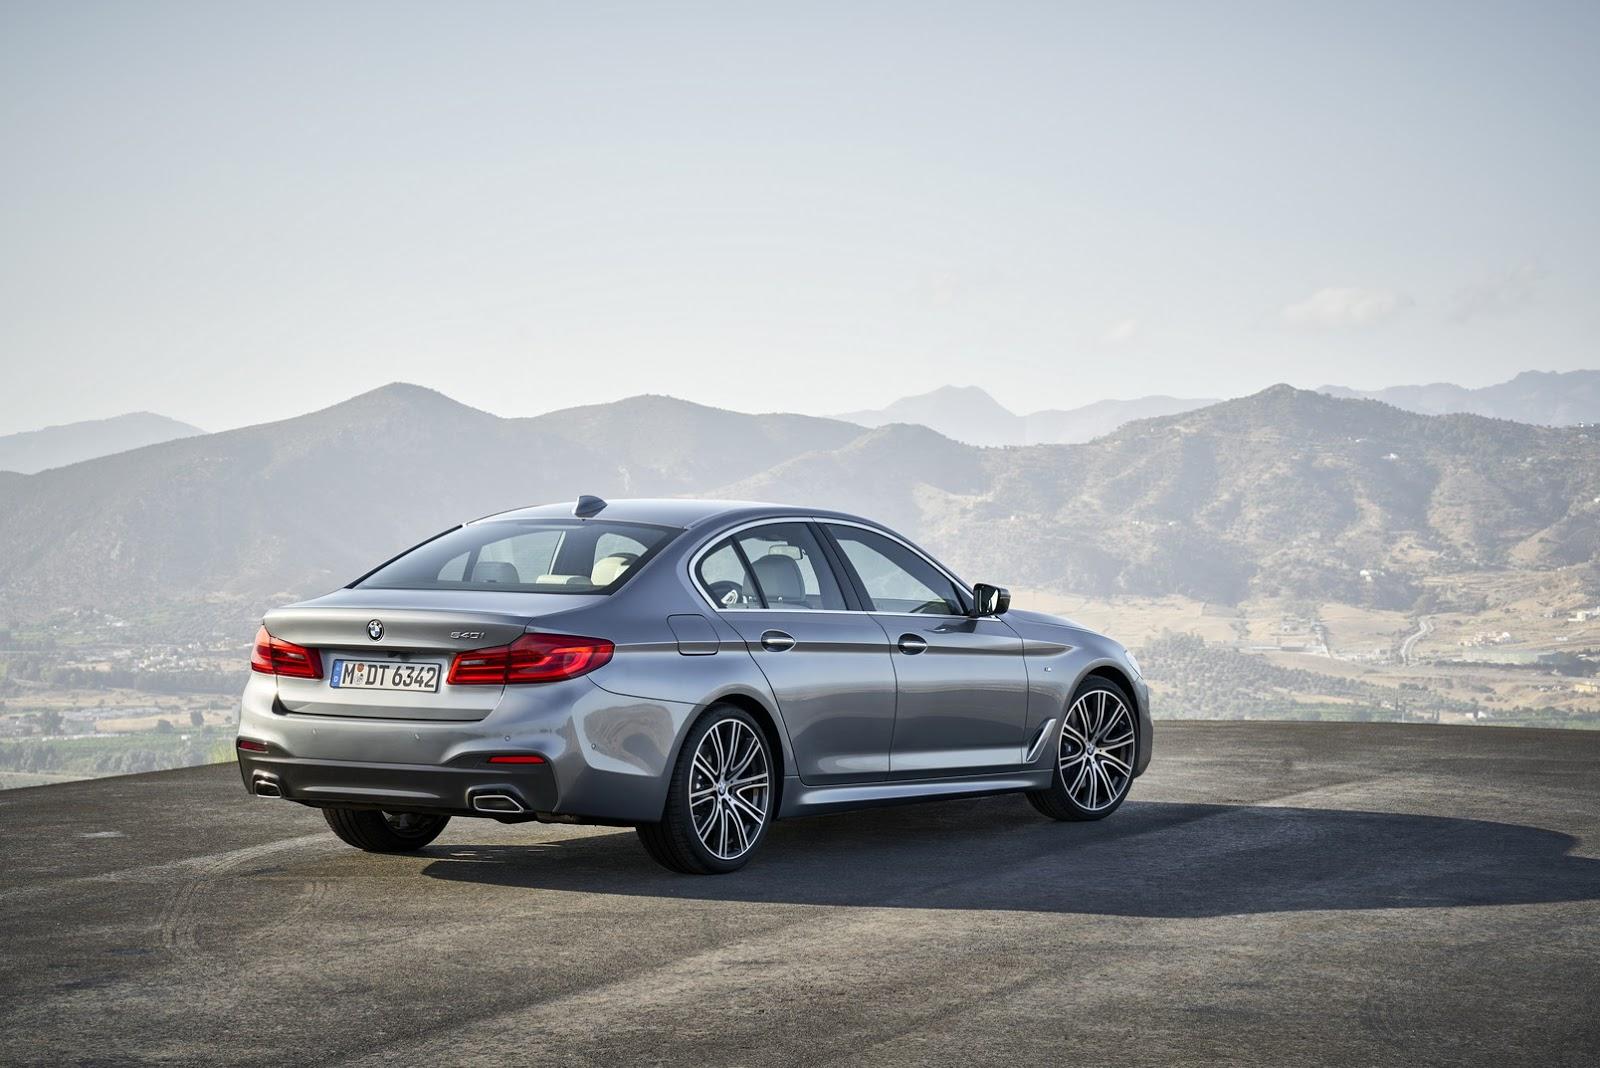 2017-BMW-5-Series-21.jpg